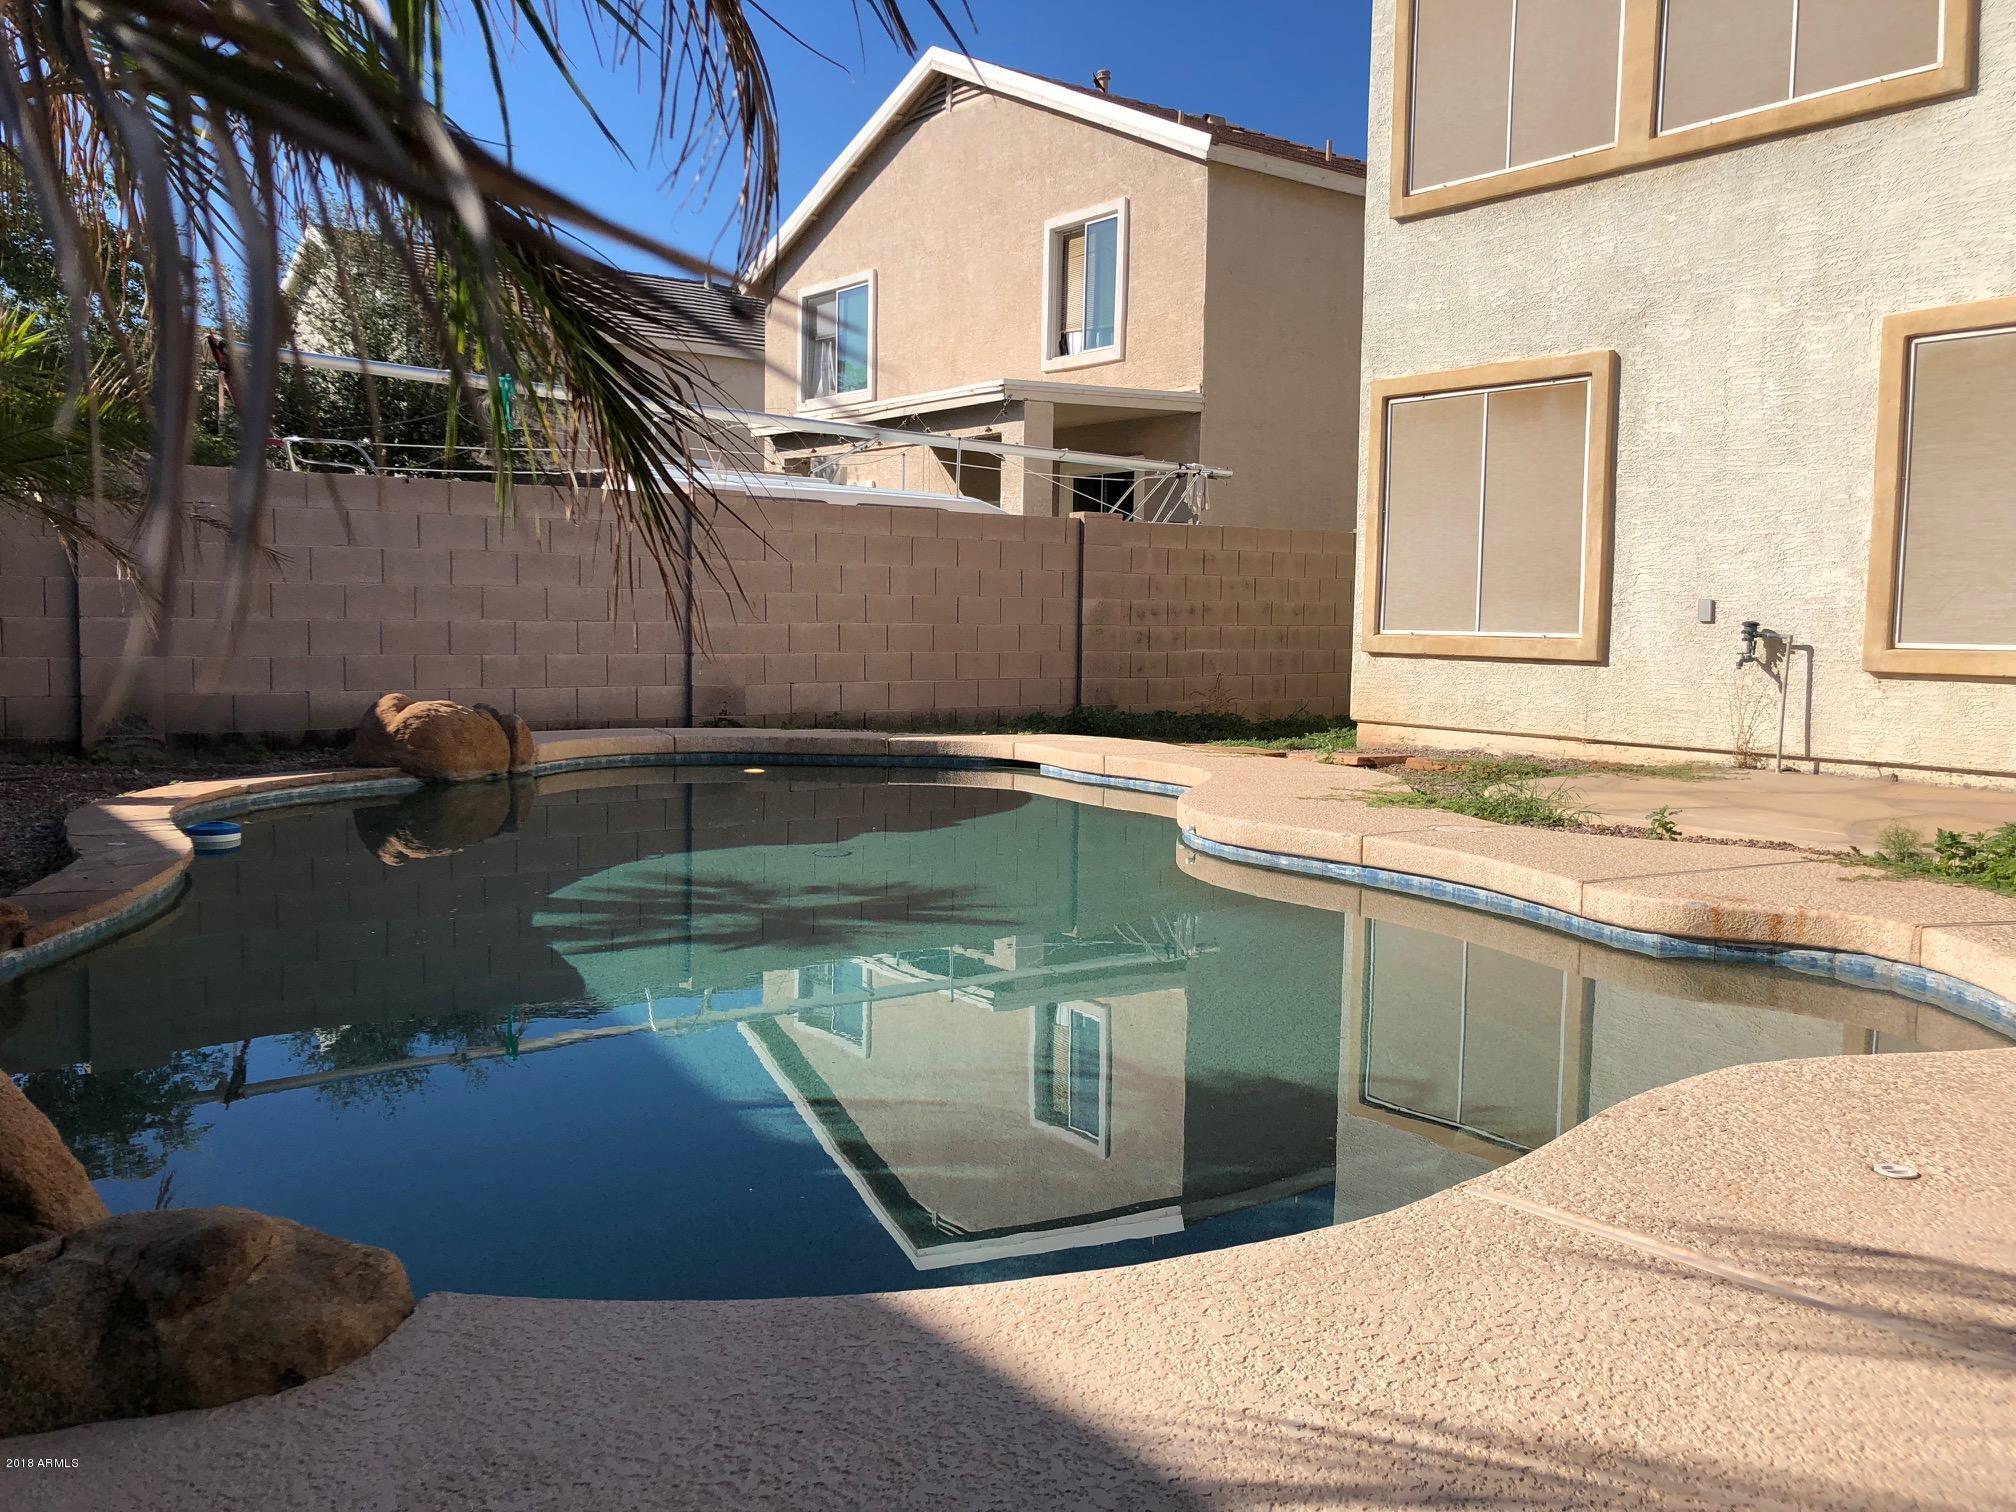 MLS 6020828 12225 W FLANAGAN Street, Avondale, AZ 85323 Avondale Homes for Rent